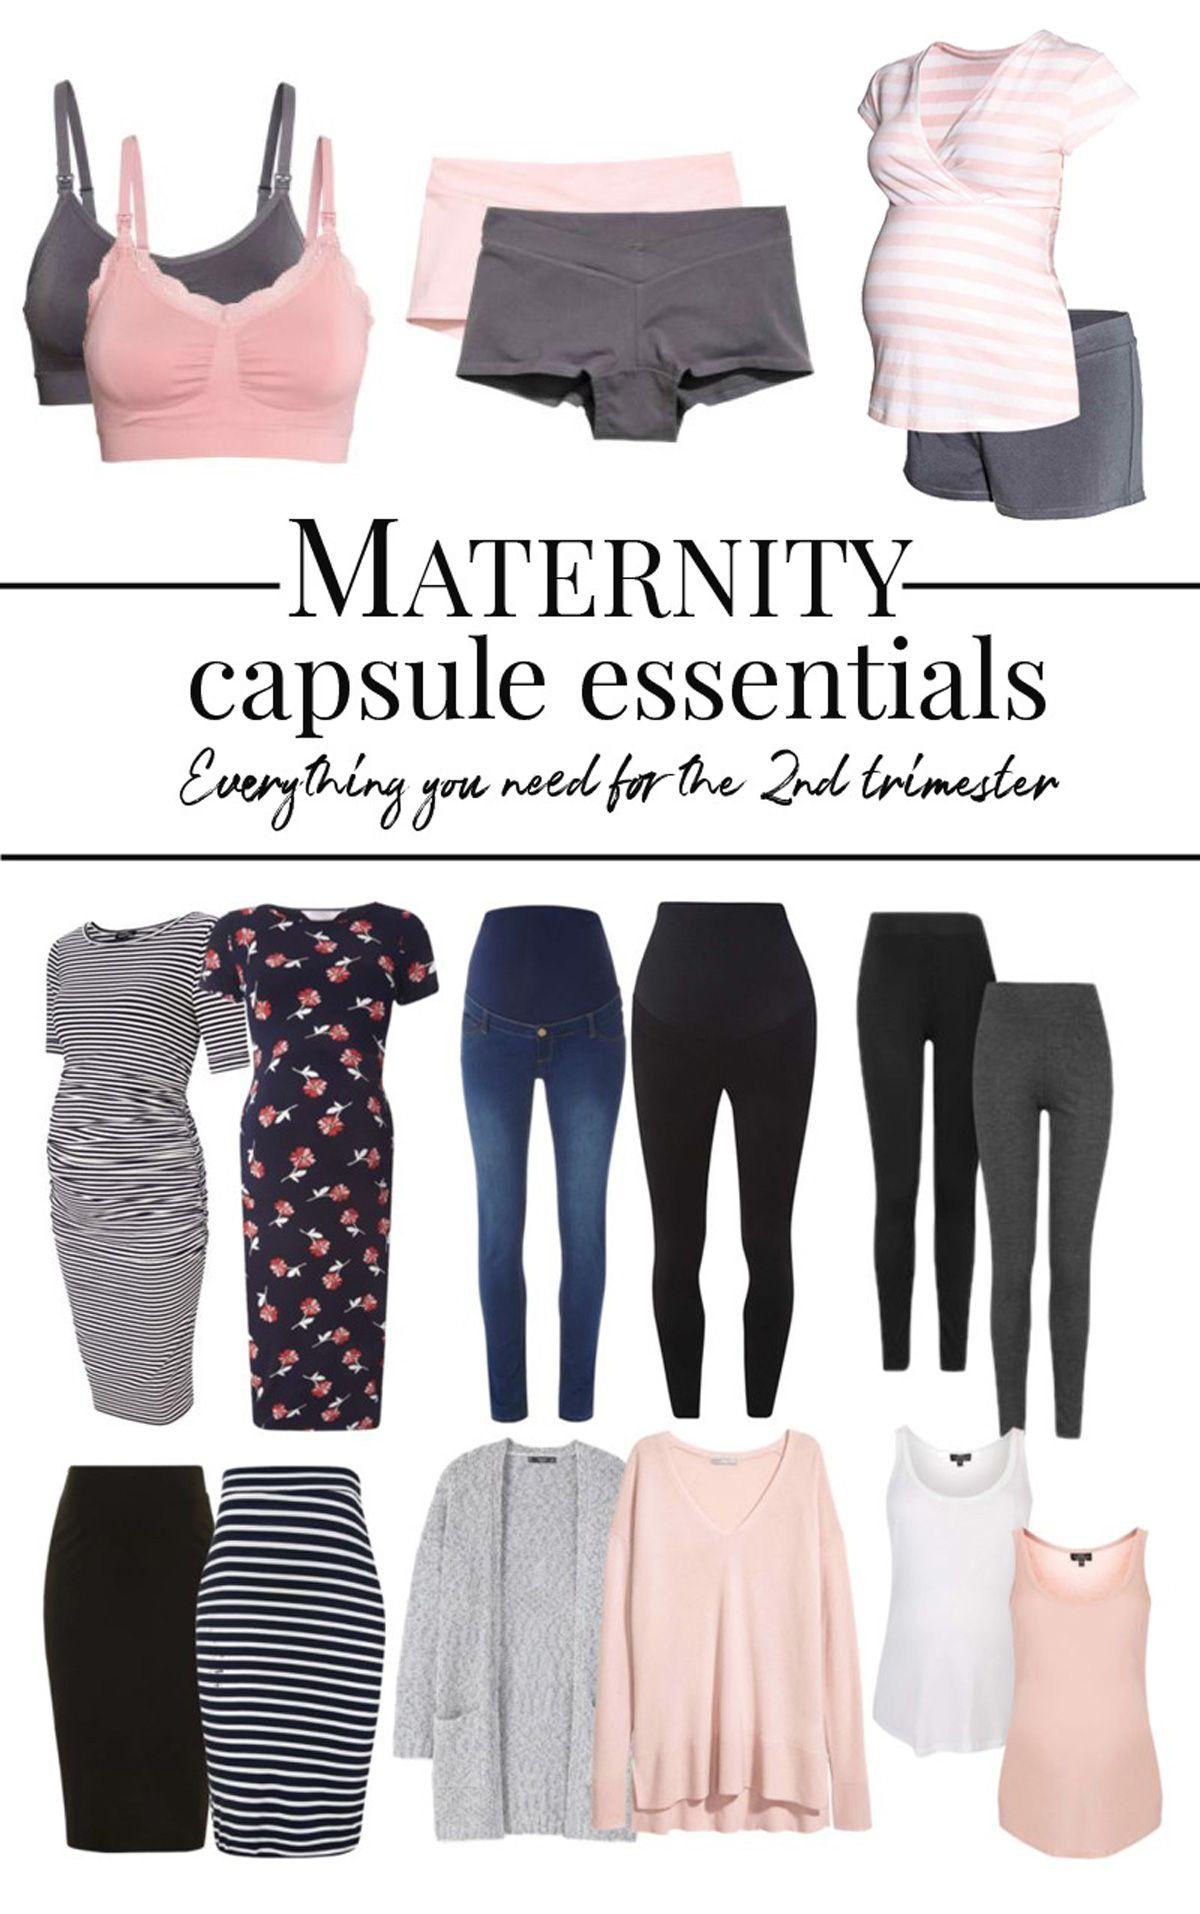 e188cc4cb maternity essentials: a small capsule wardrobe for pregnancy and beyond